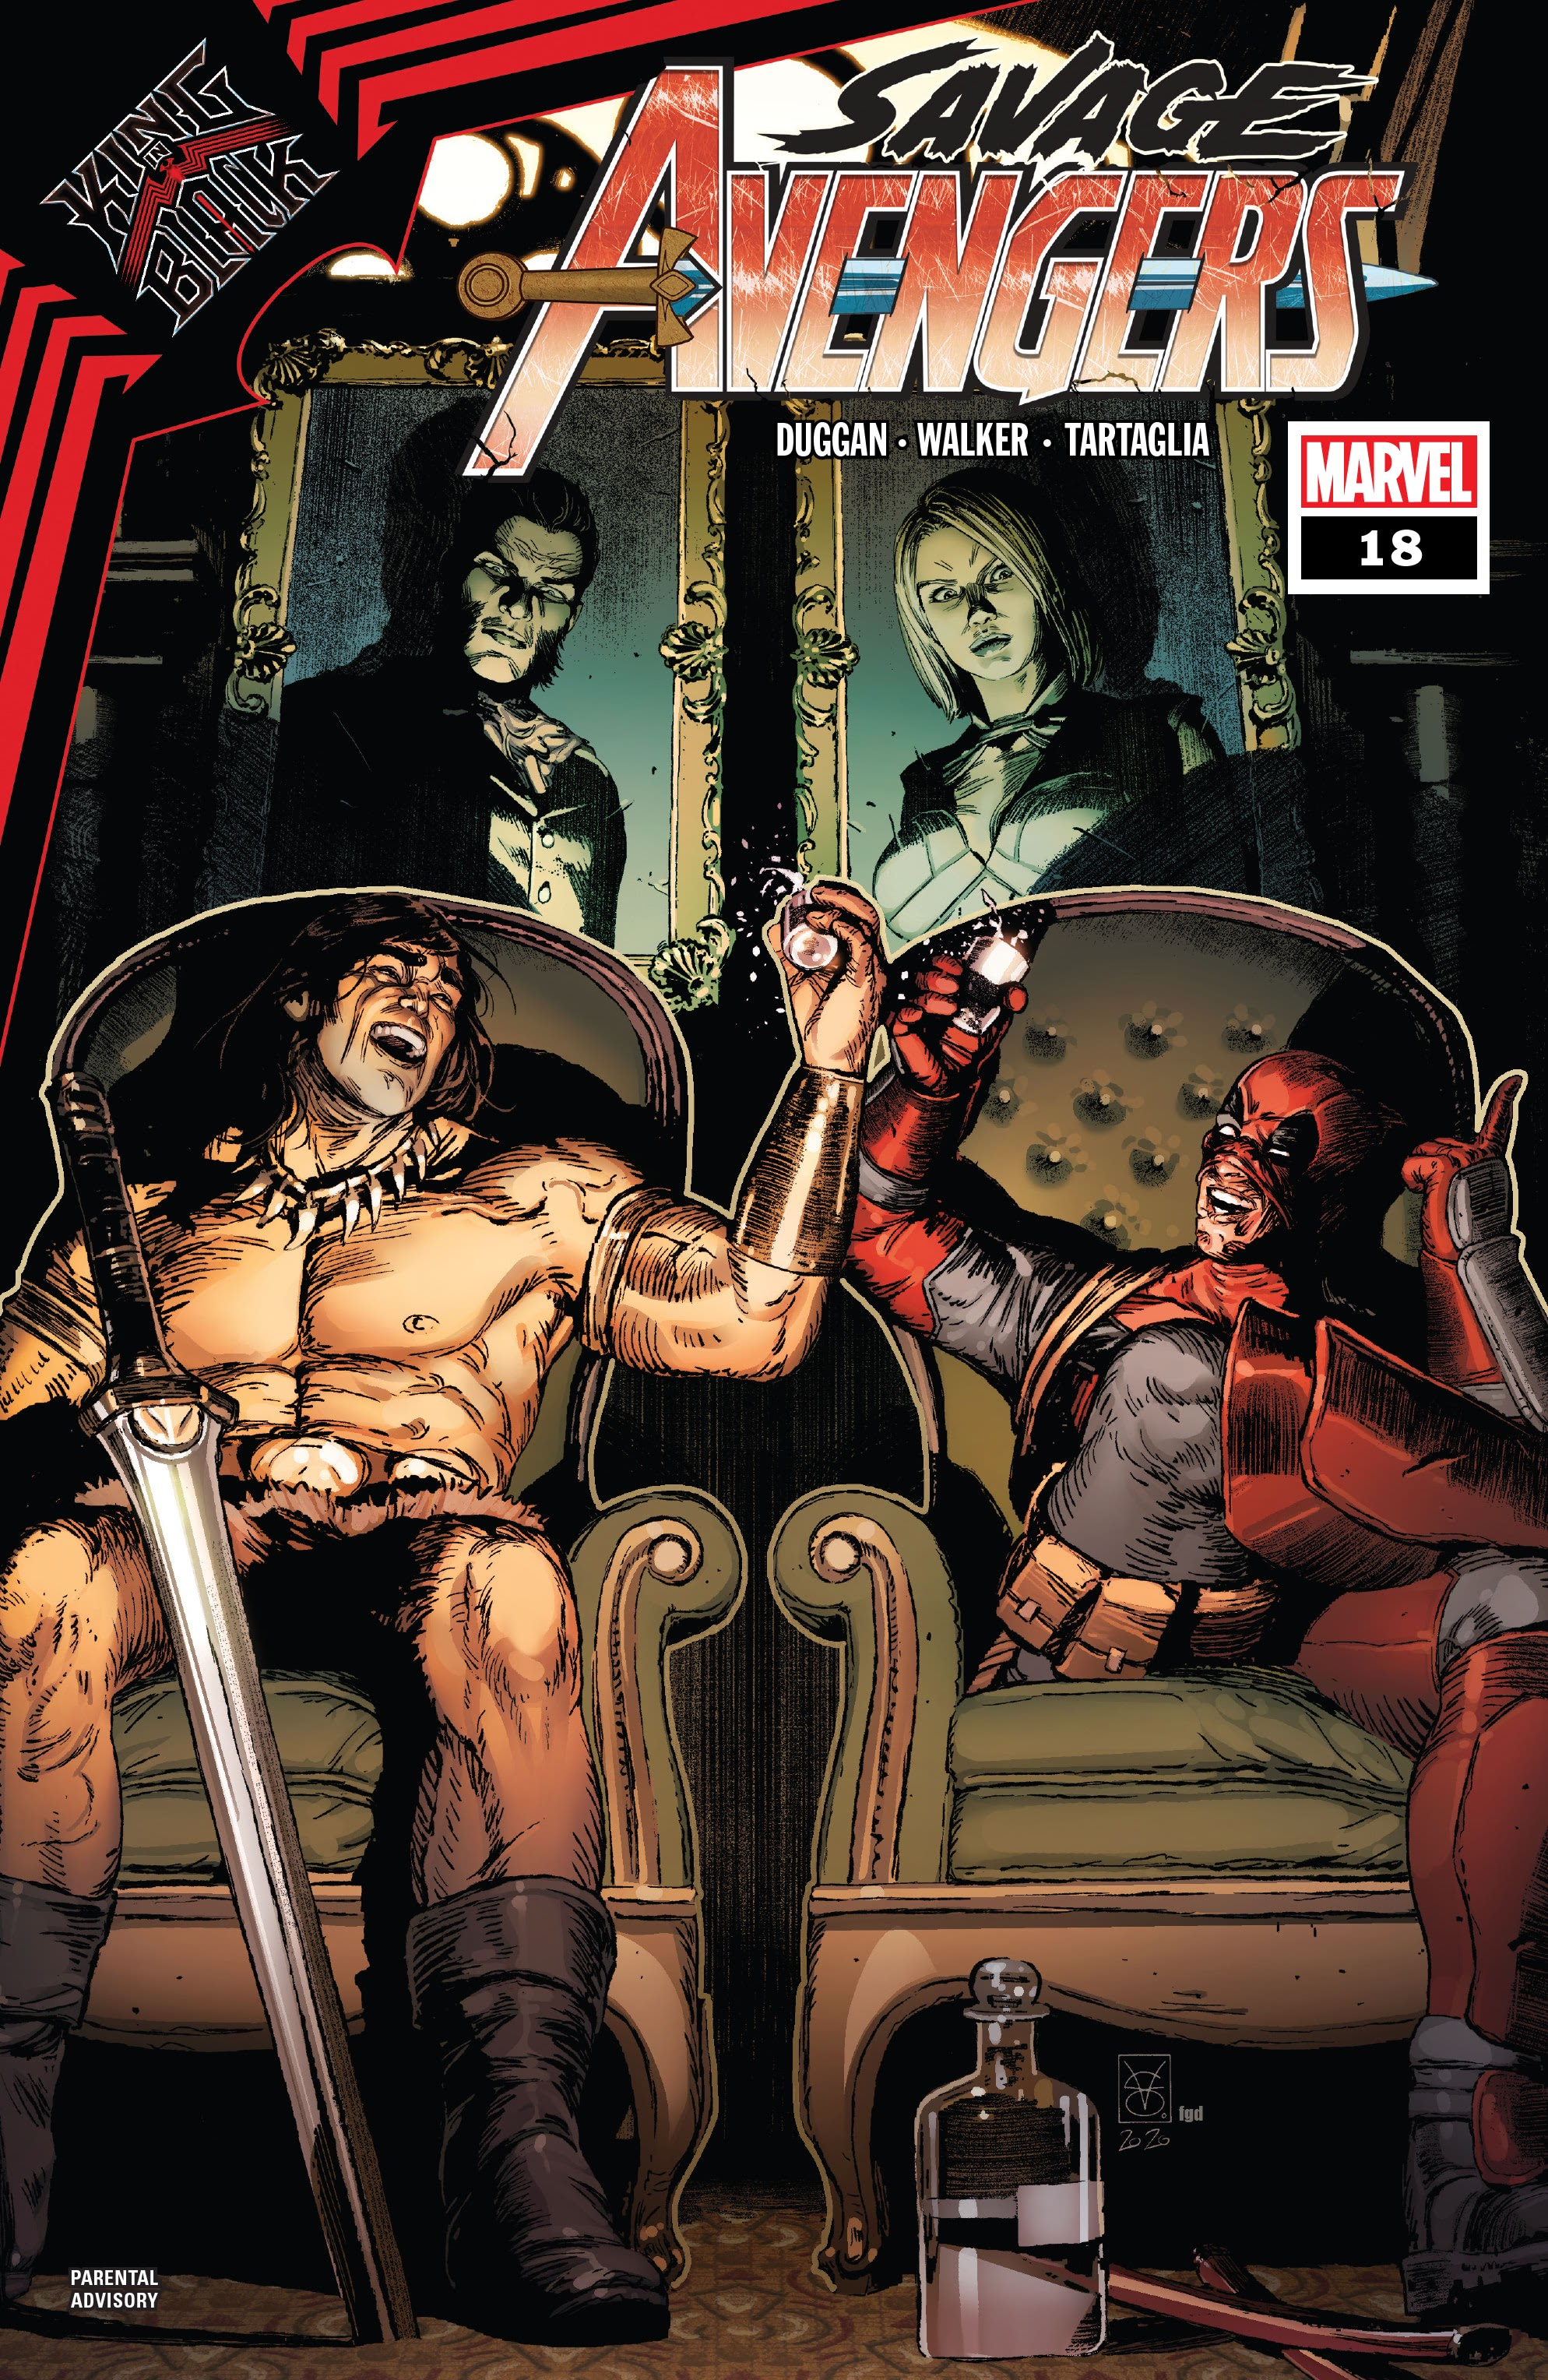 Savage Avengers 18 Page 1